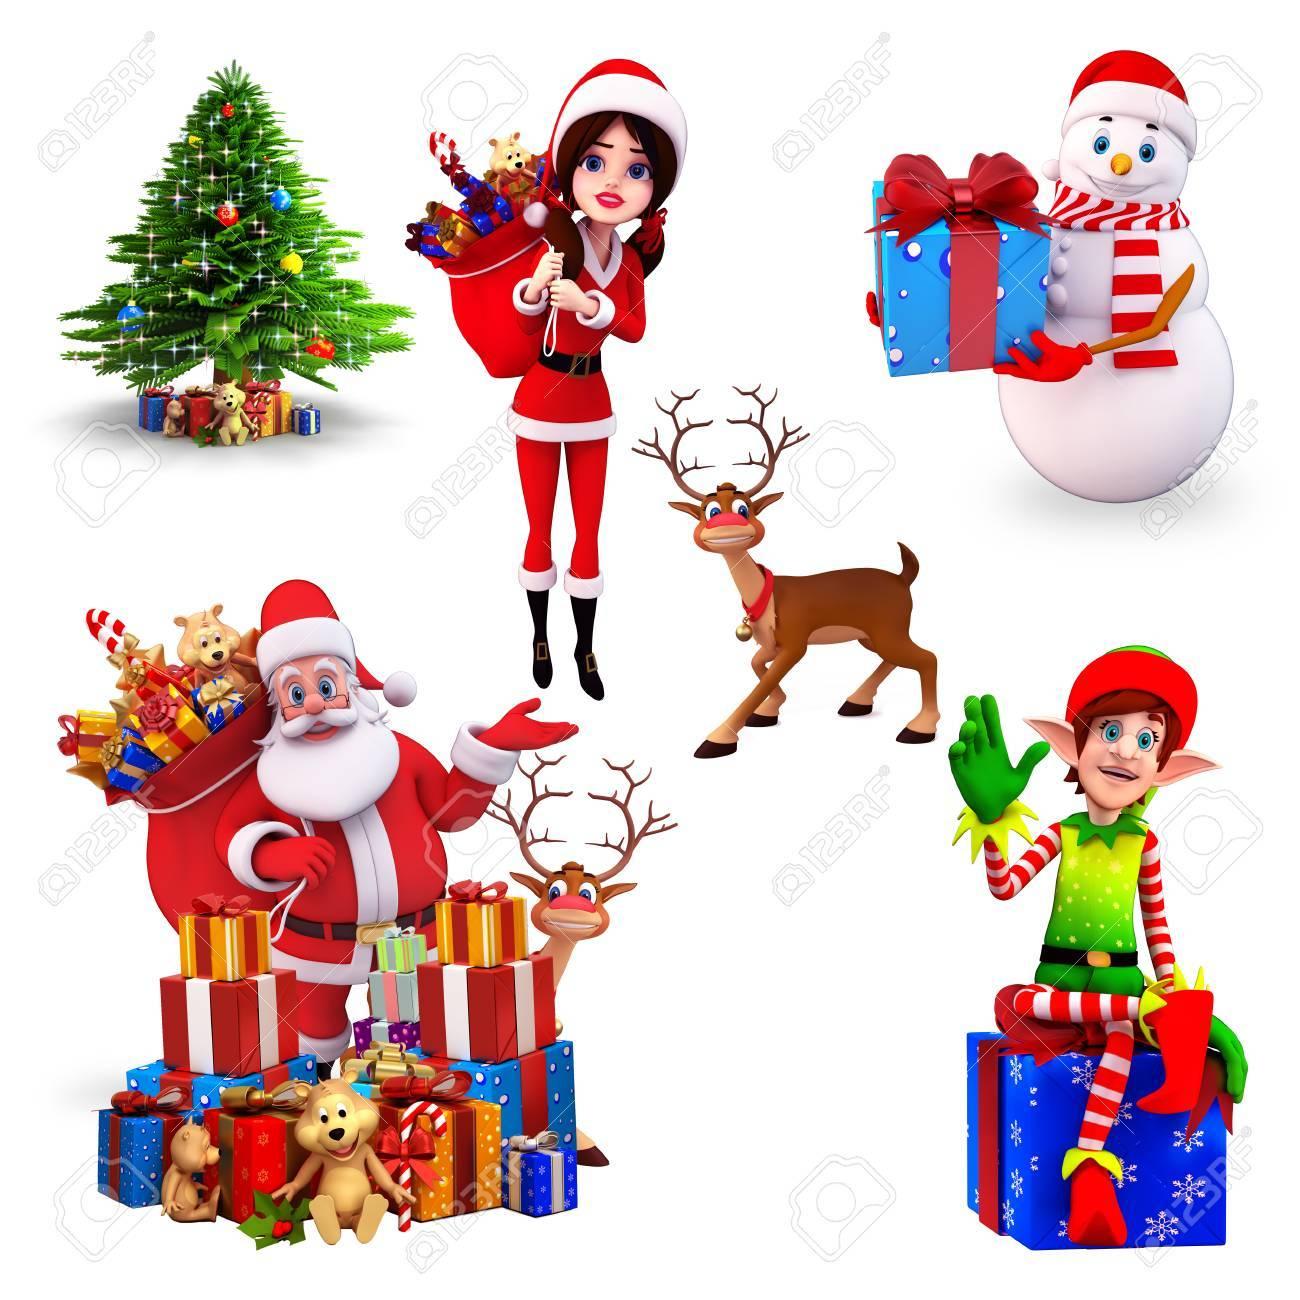 Christmas element Stock Photo - 23555895